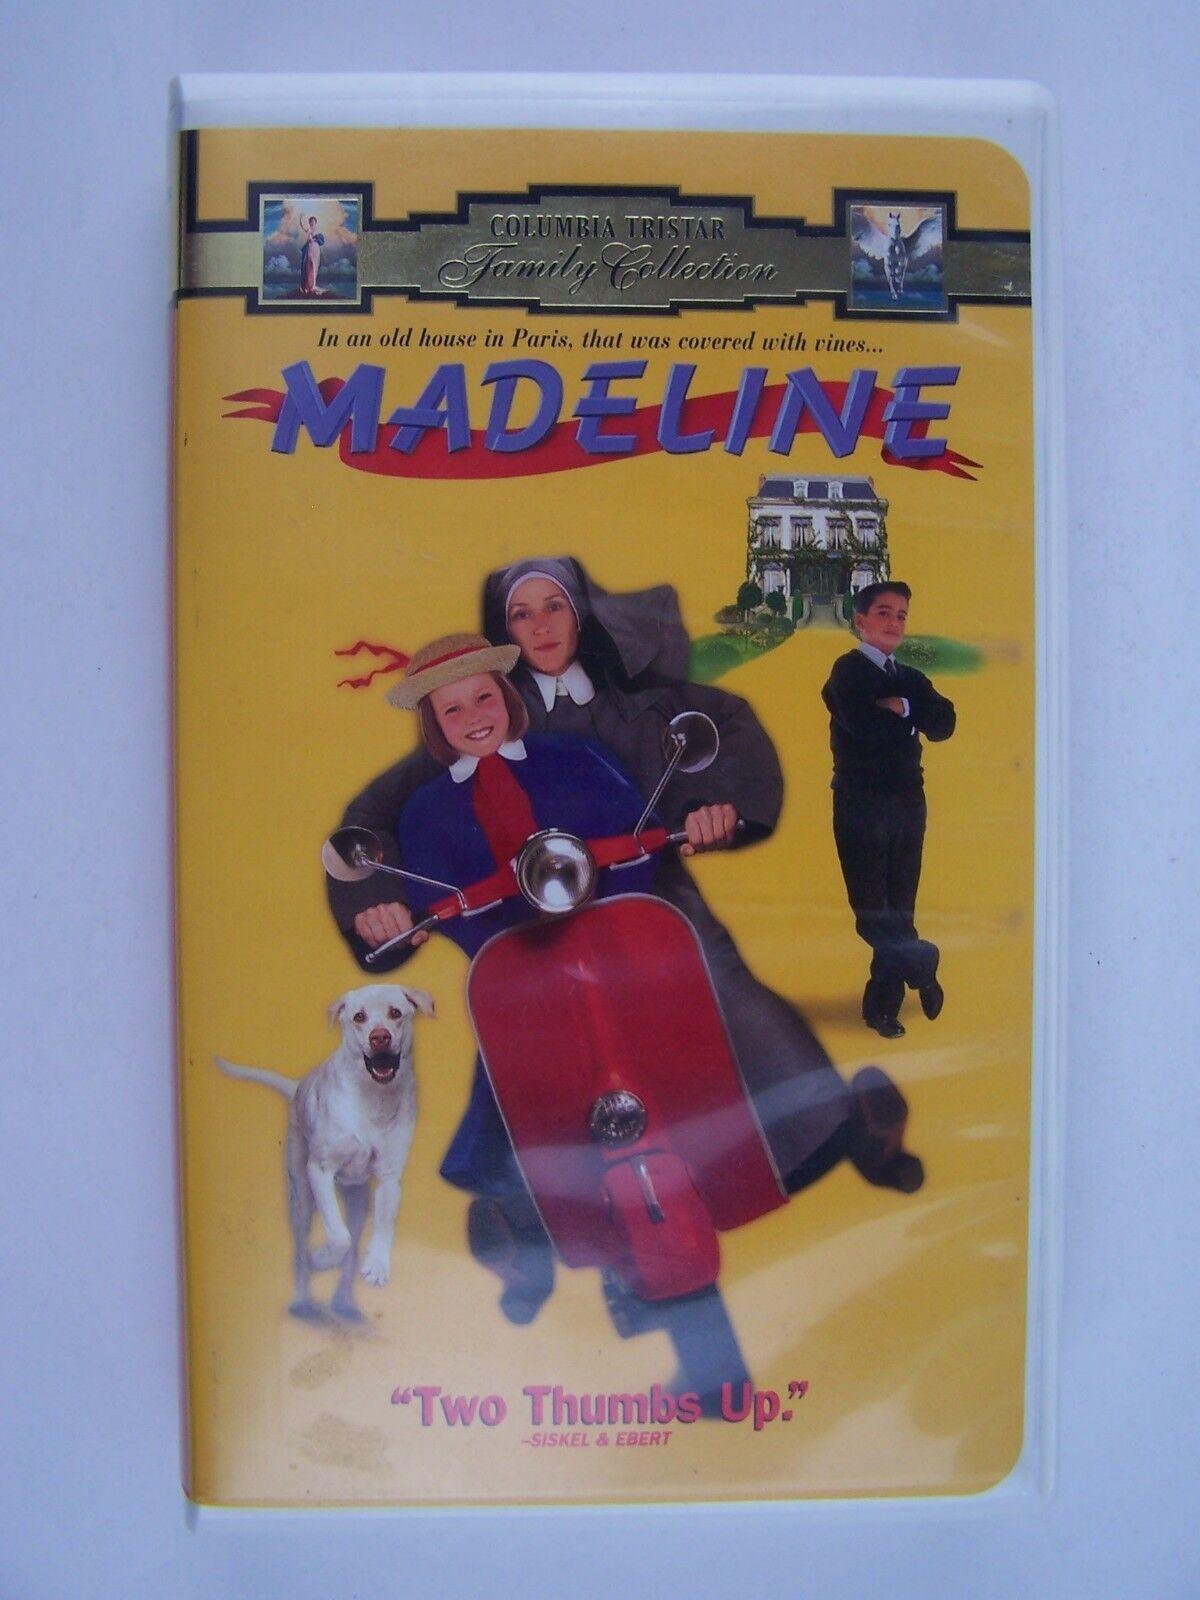 Madeline VHS Video Tape Frances McDormand, Nigel Hawtho